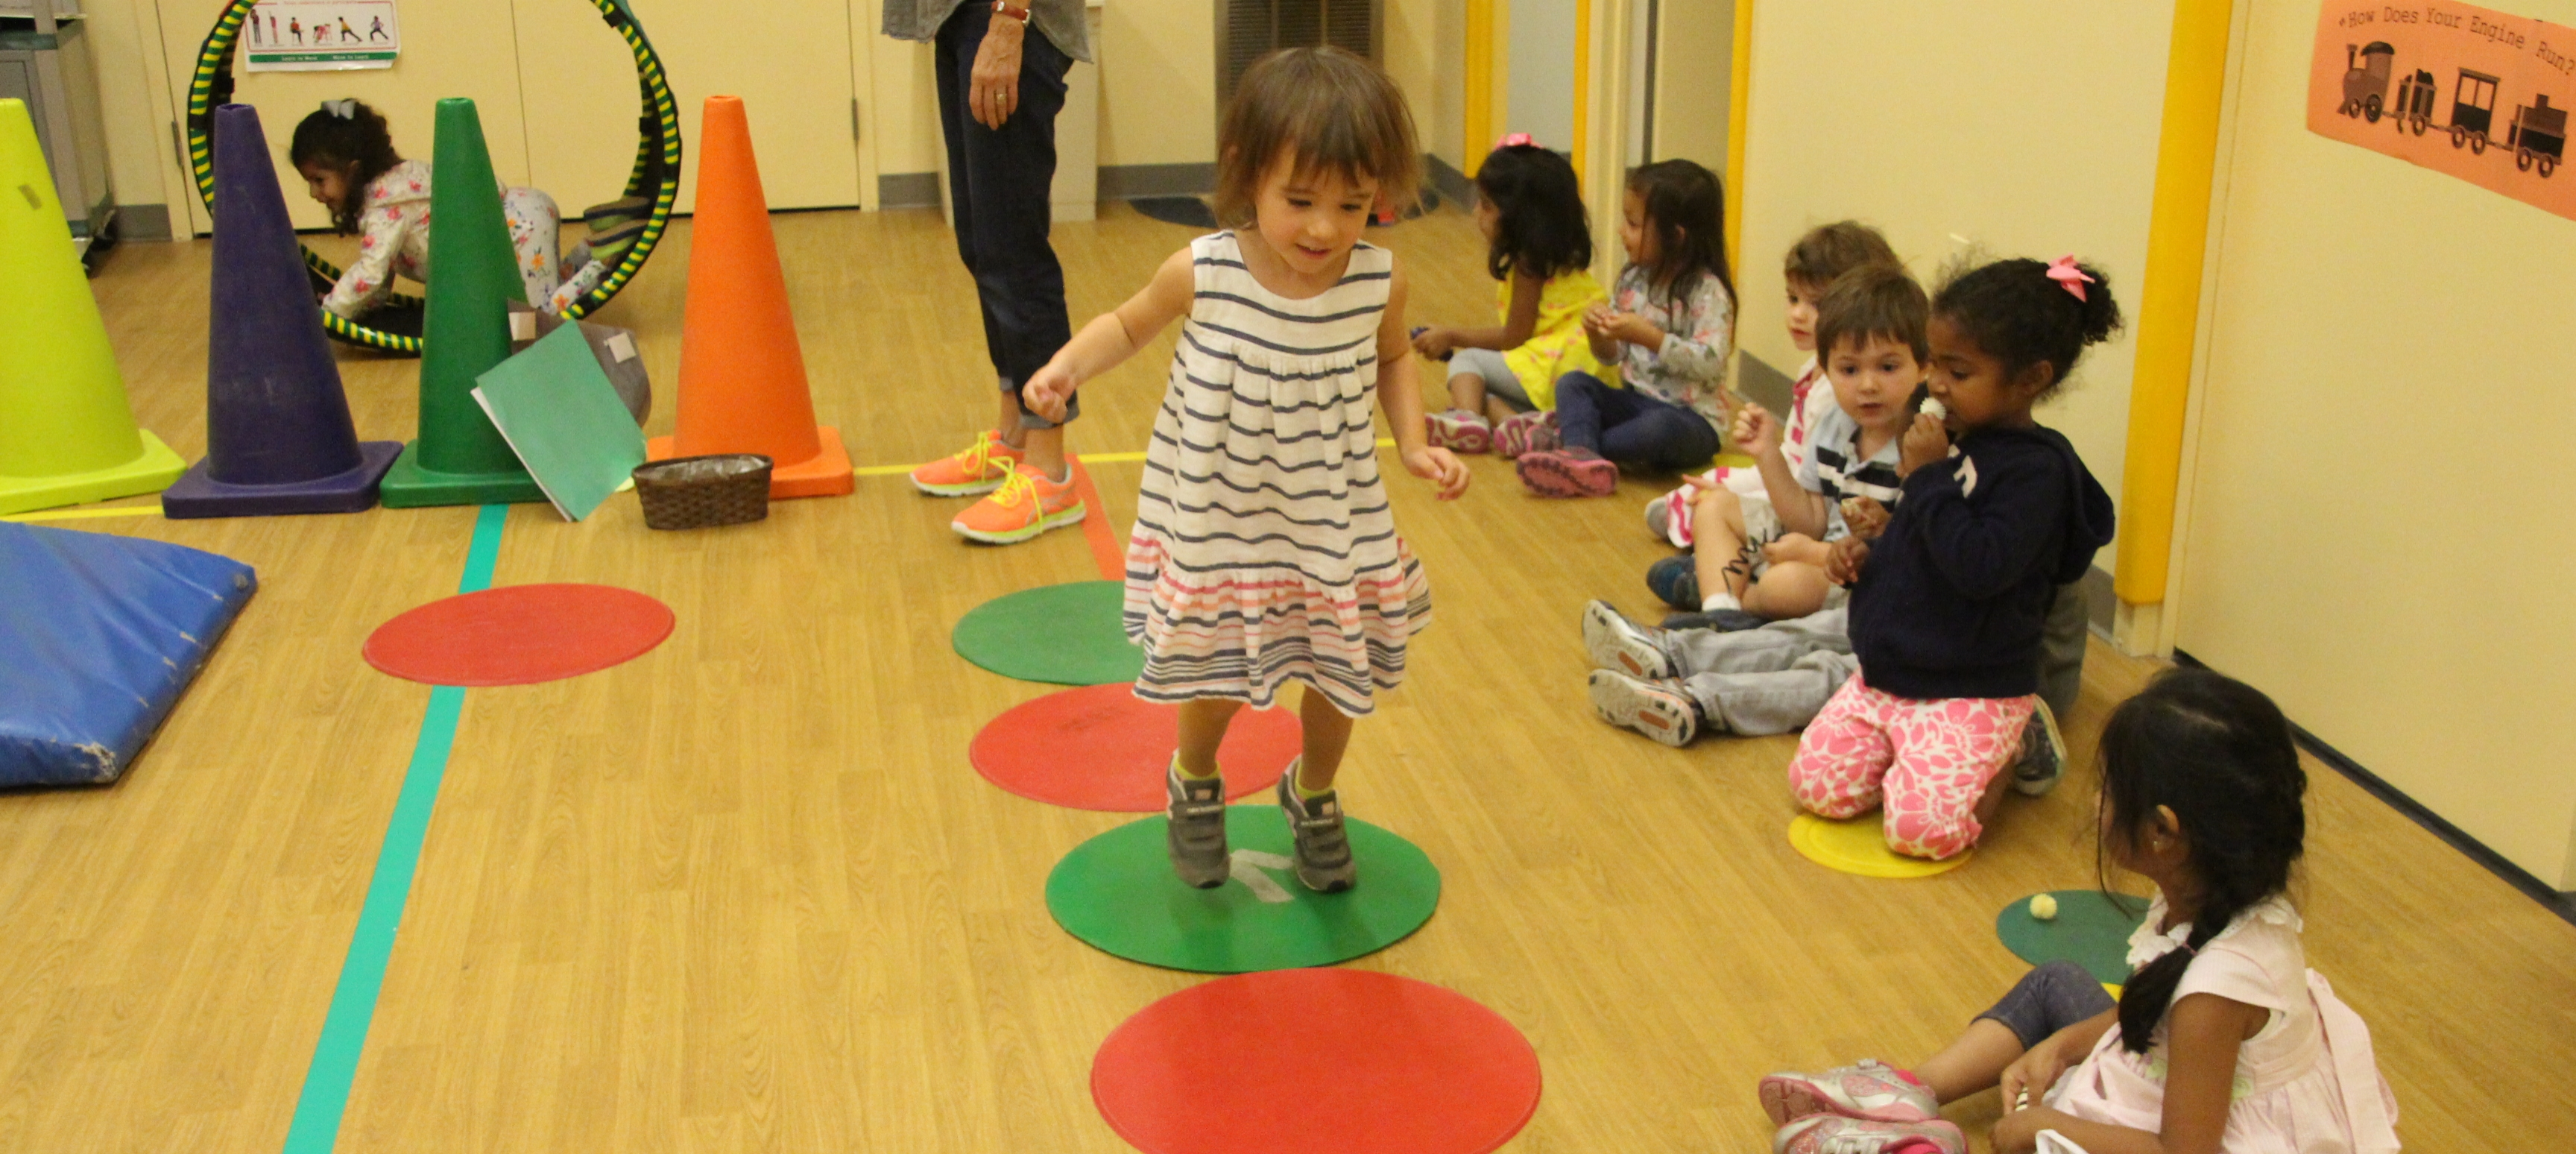 ncrc preschool enrichment national child research center 748